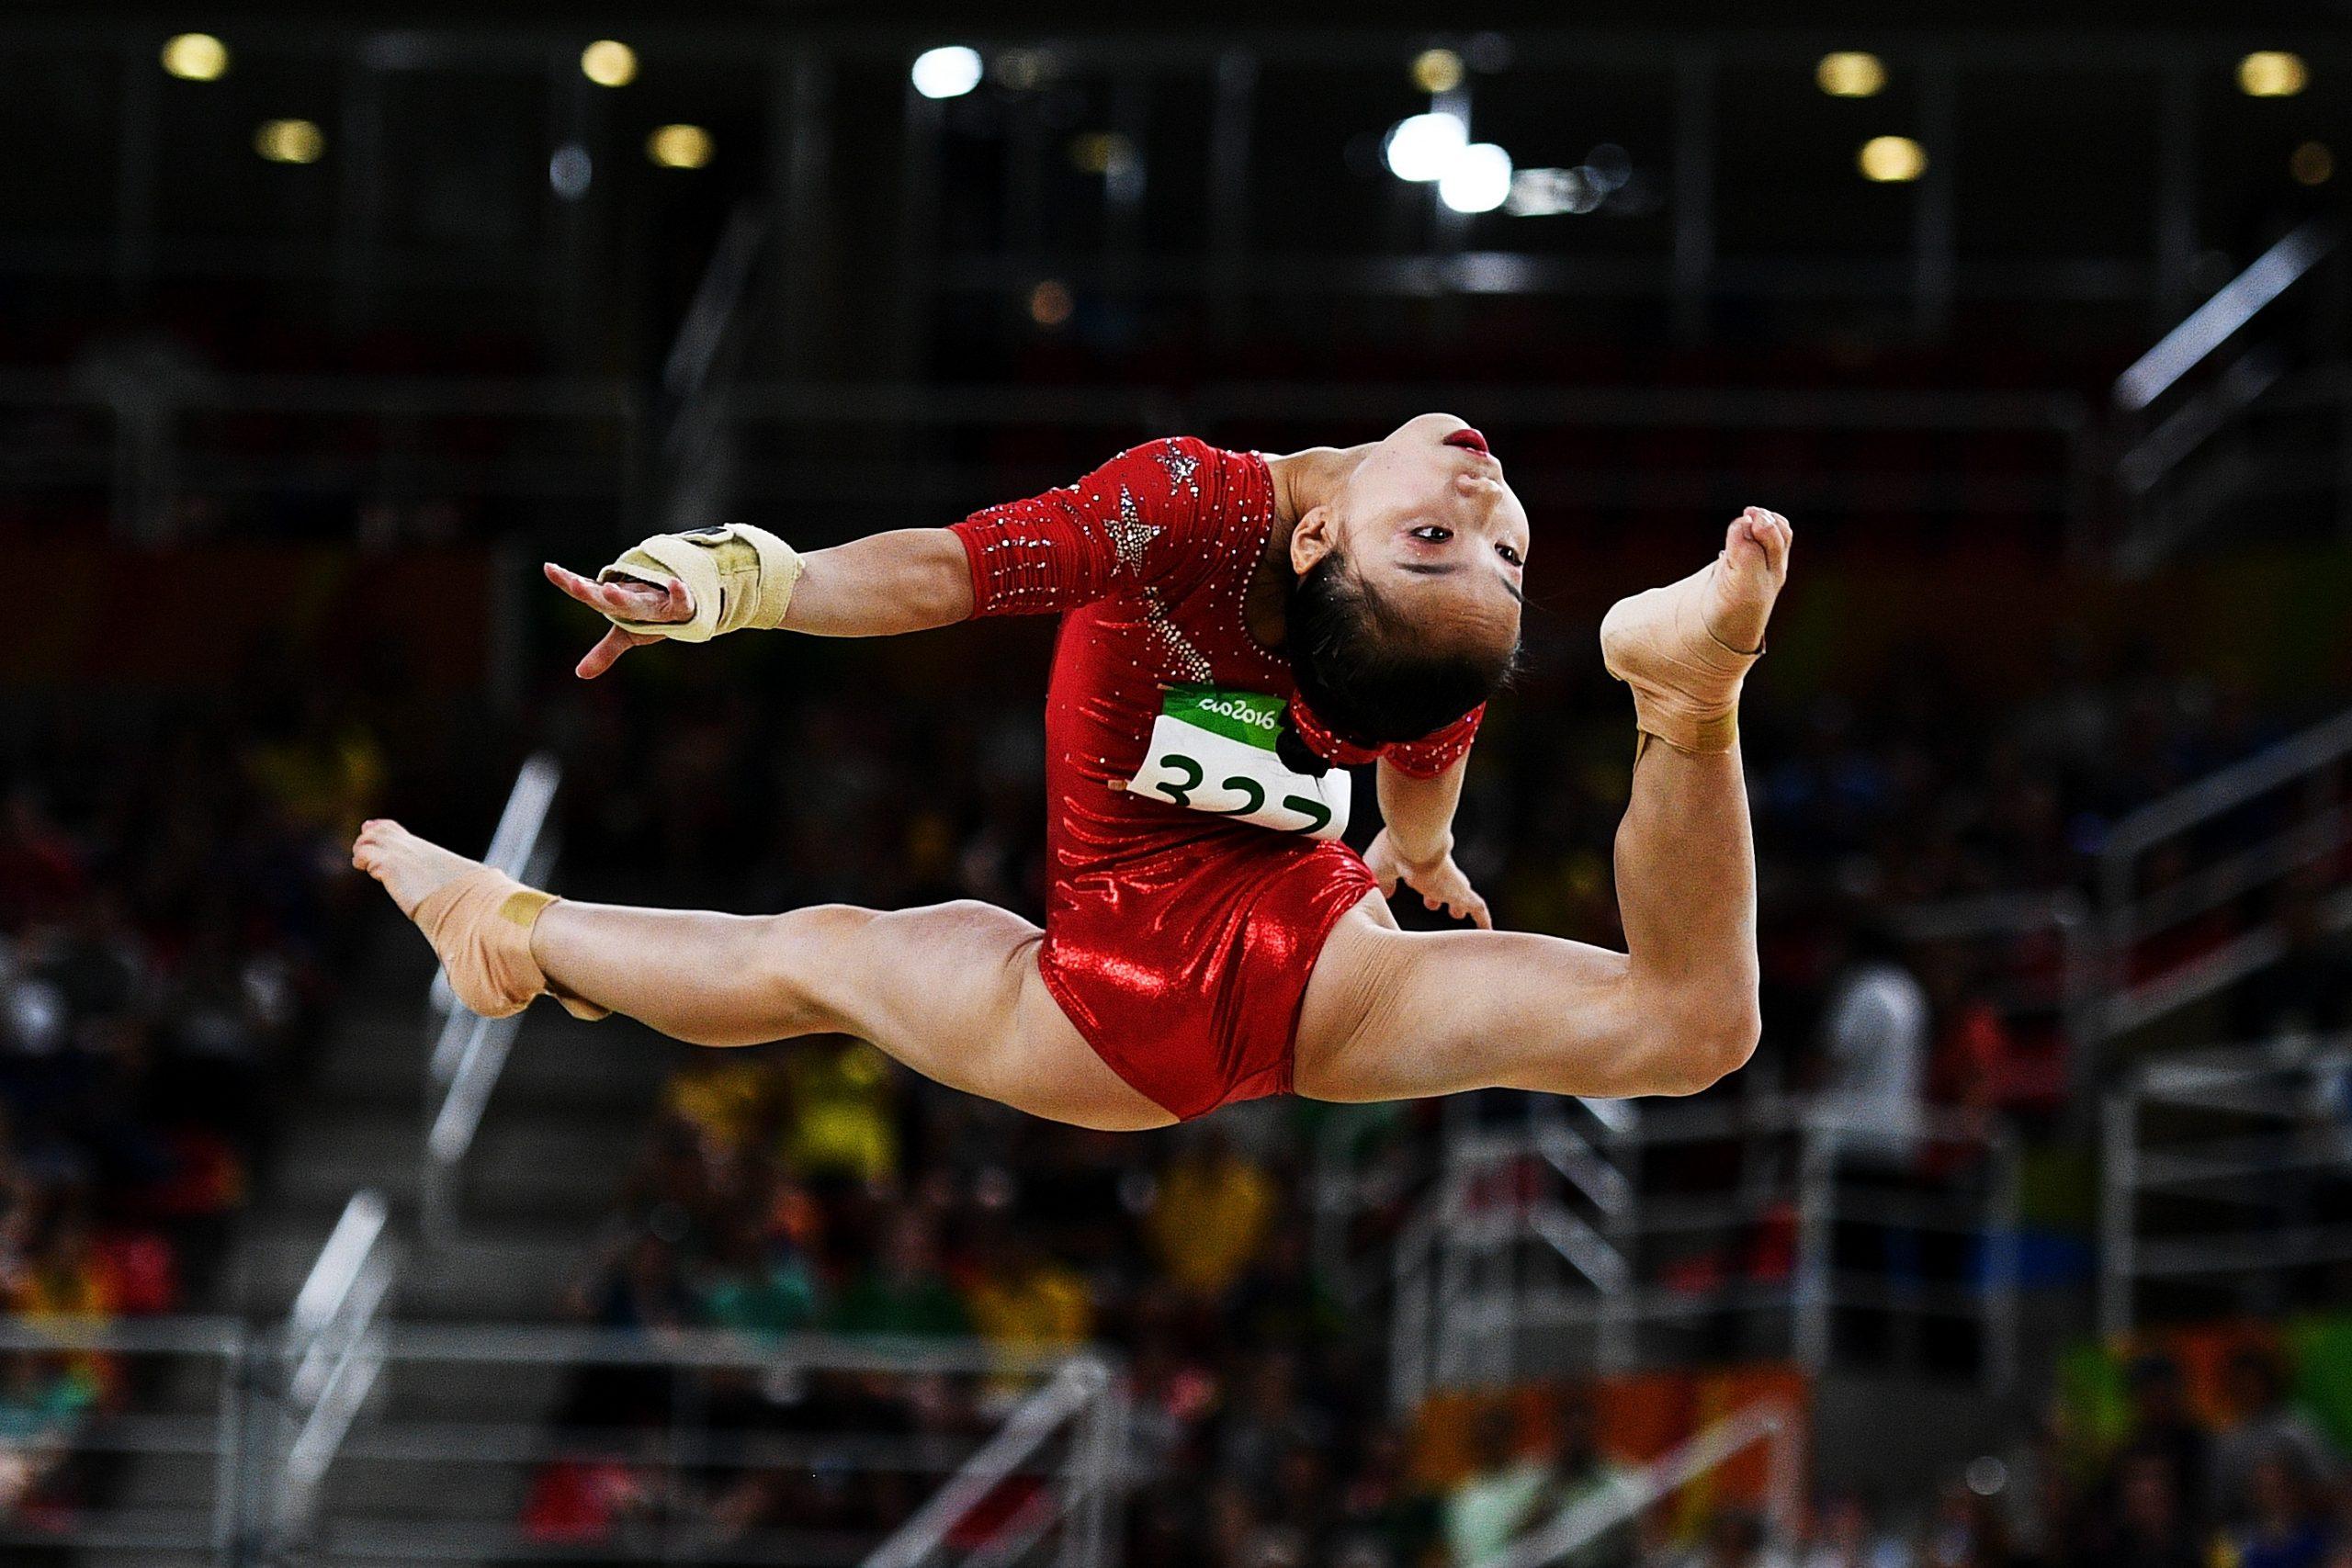 Gymnaste en plein saut.